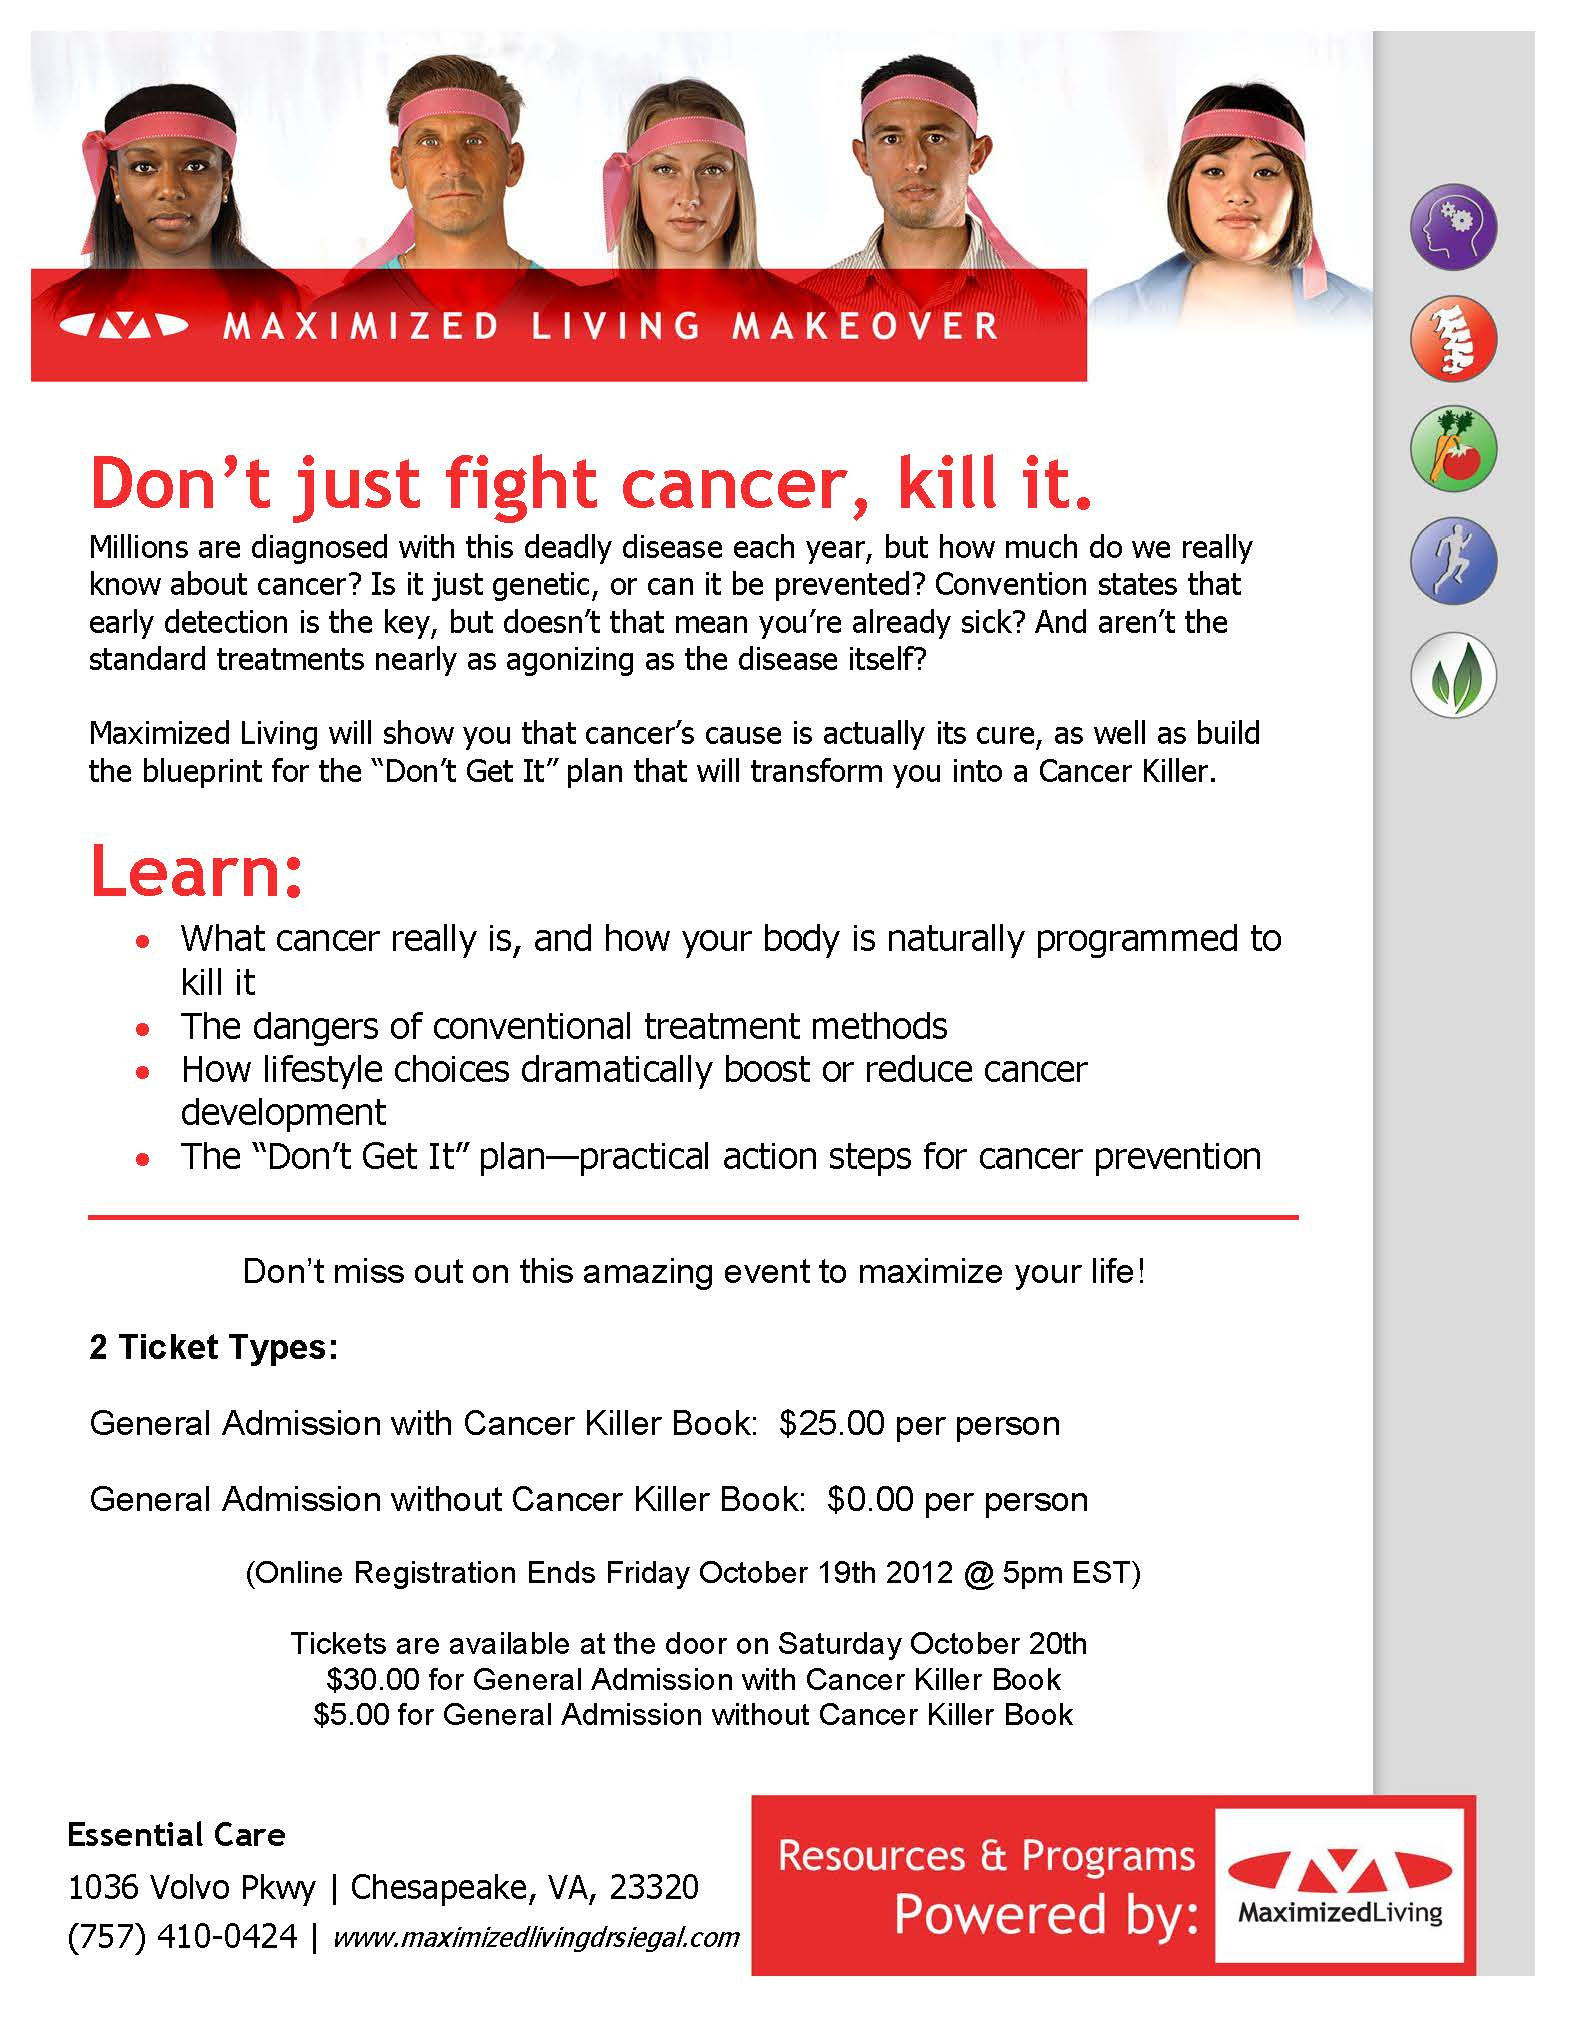 Cancer Killers Ticket Image